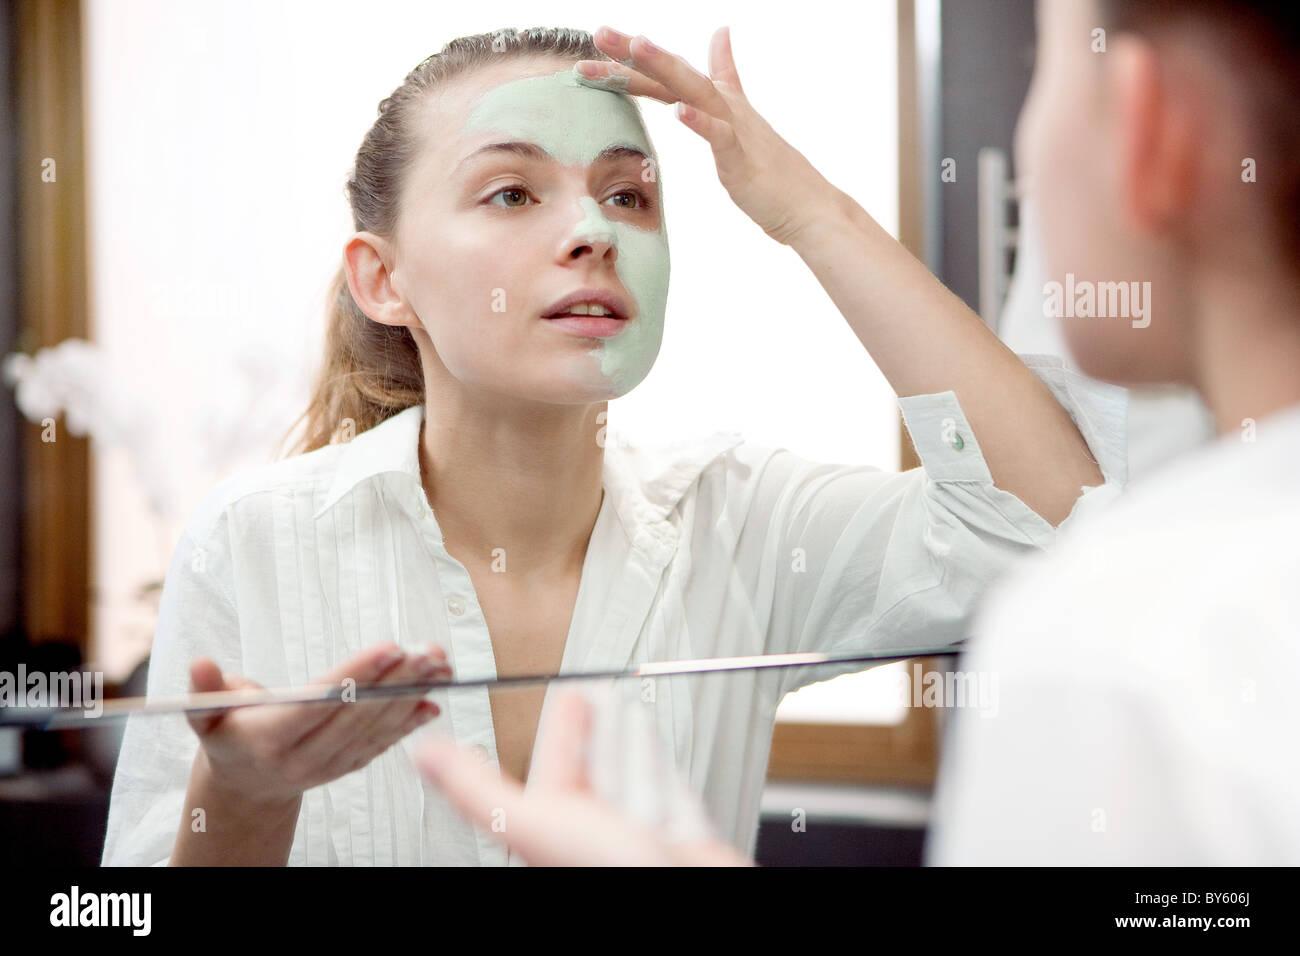 woman applying face mask - Stock Image